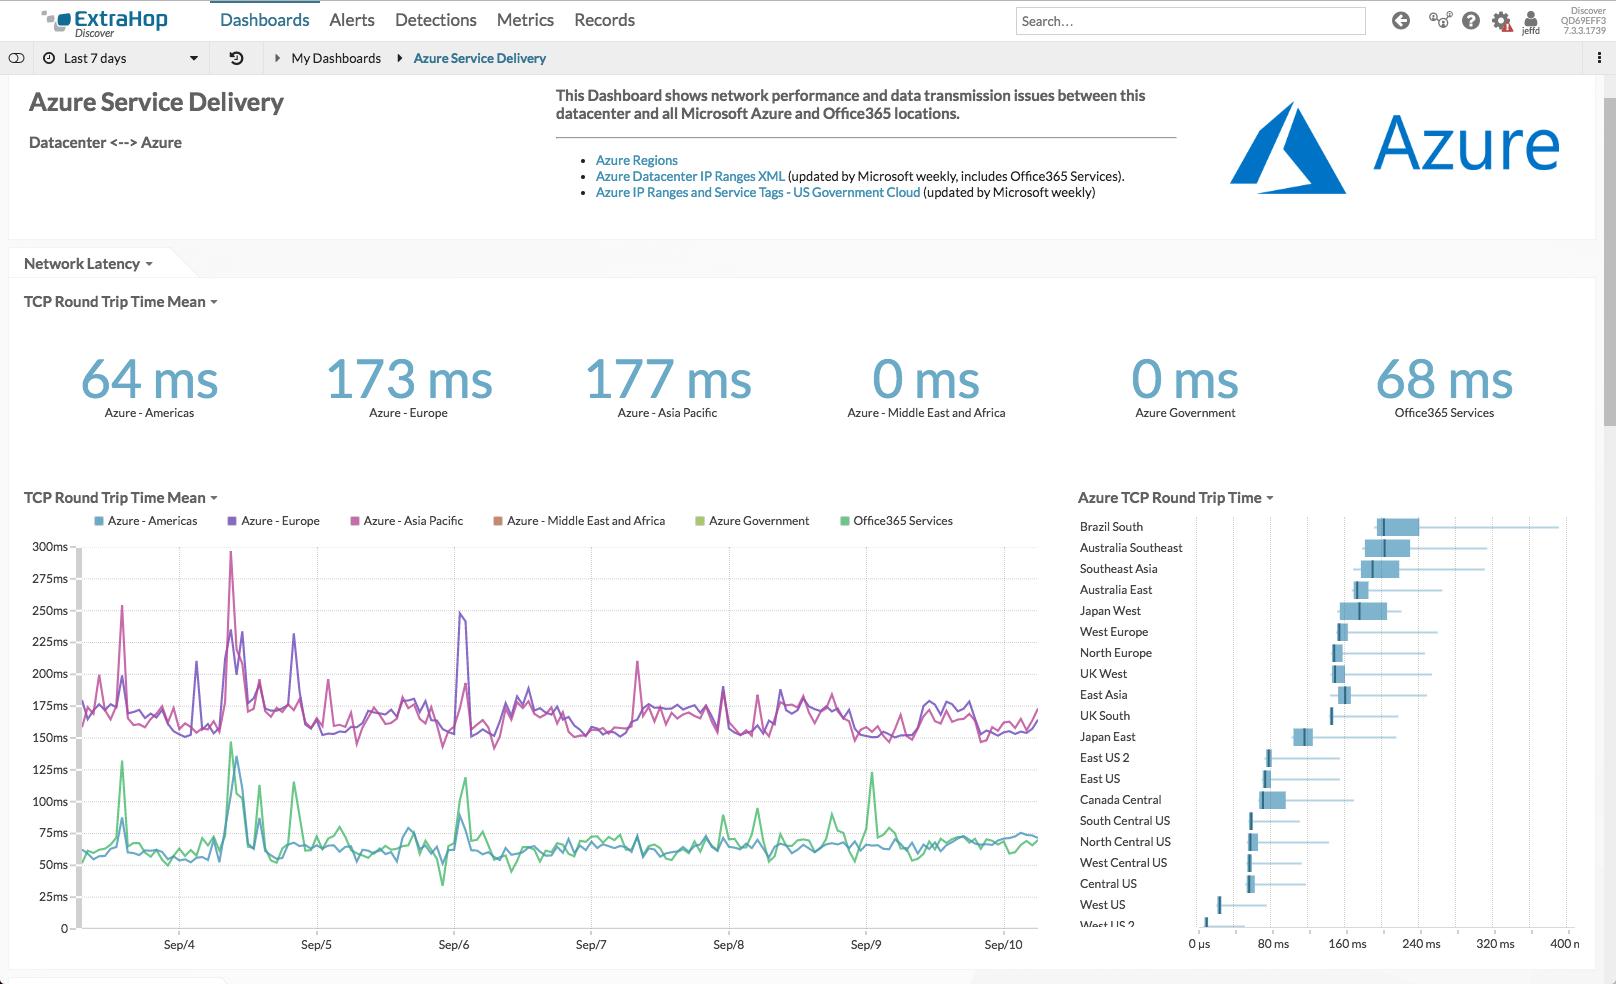 Azure Dashboard Image